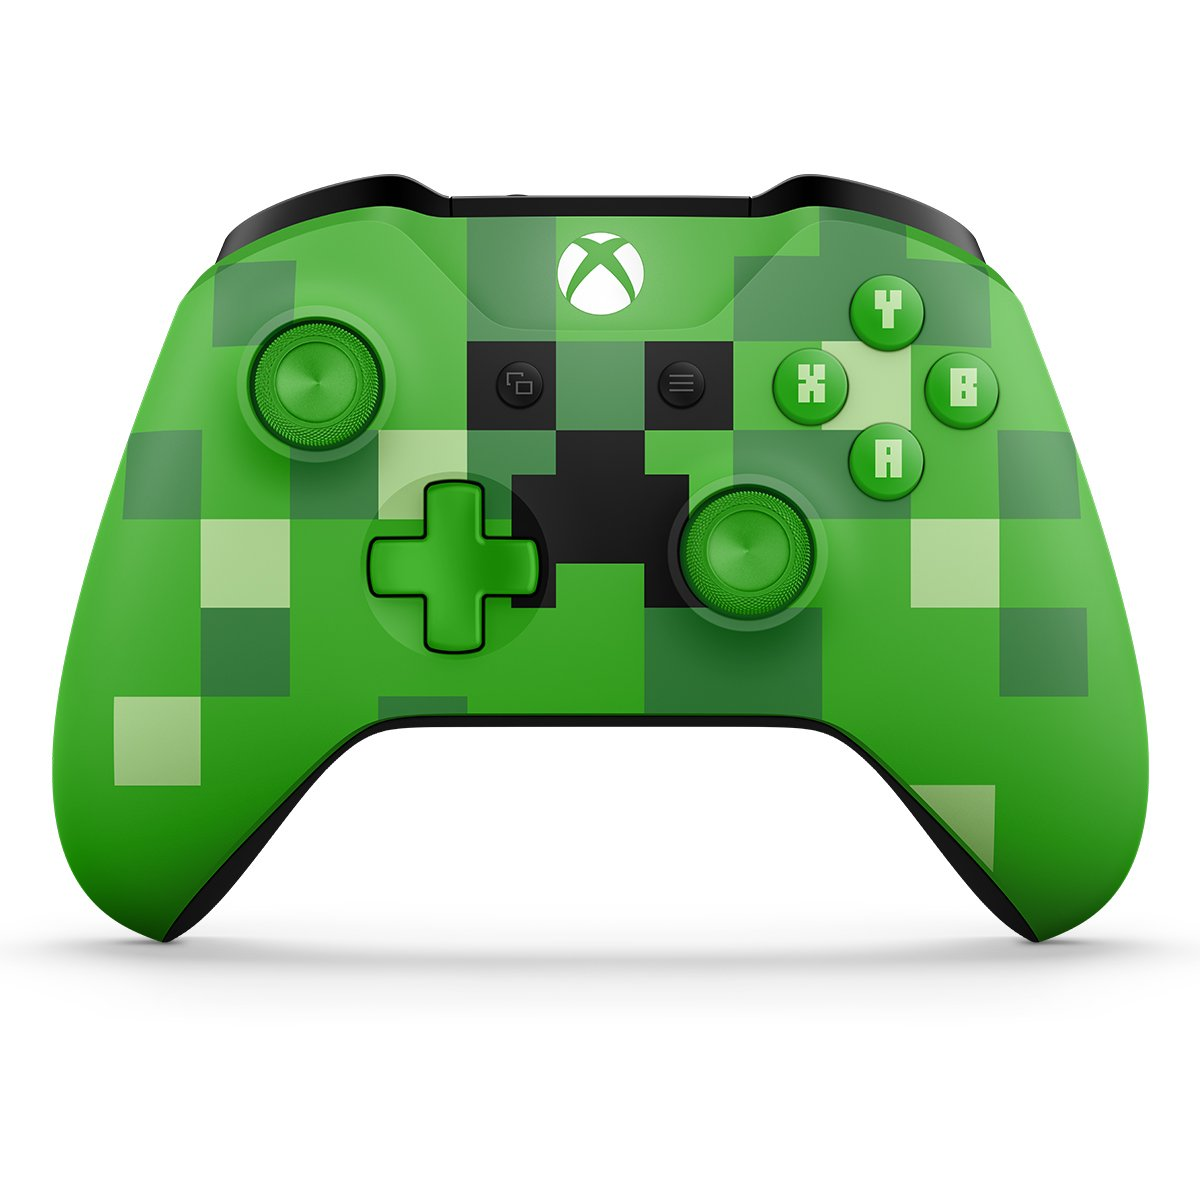 Xbox Wireless Controller - Minecraft Creeper - Minecraft Creeper Edition product image